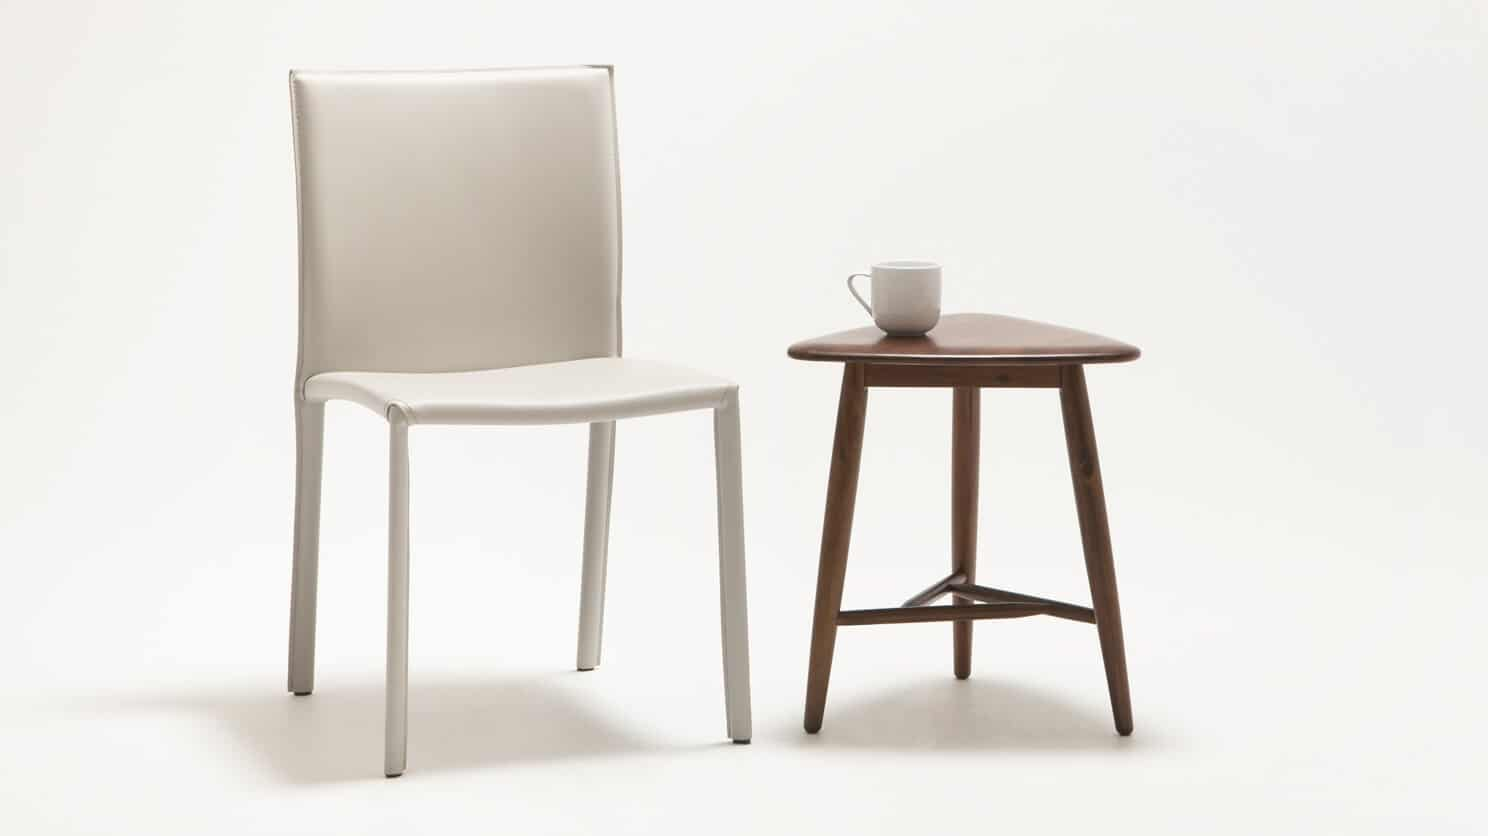 7110 090 49 3 end tables kacia end table detail 01